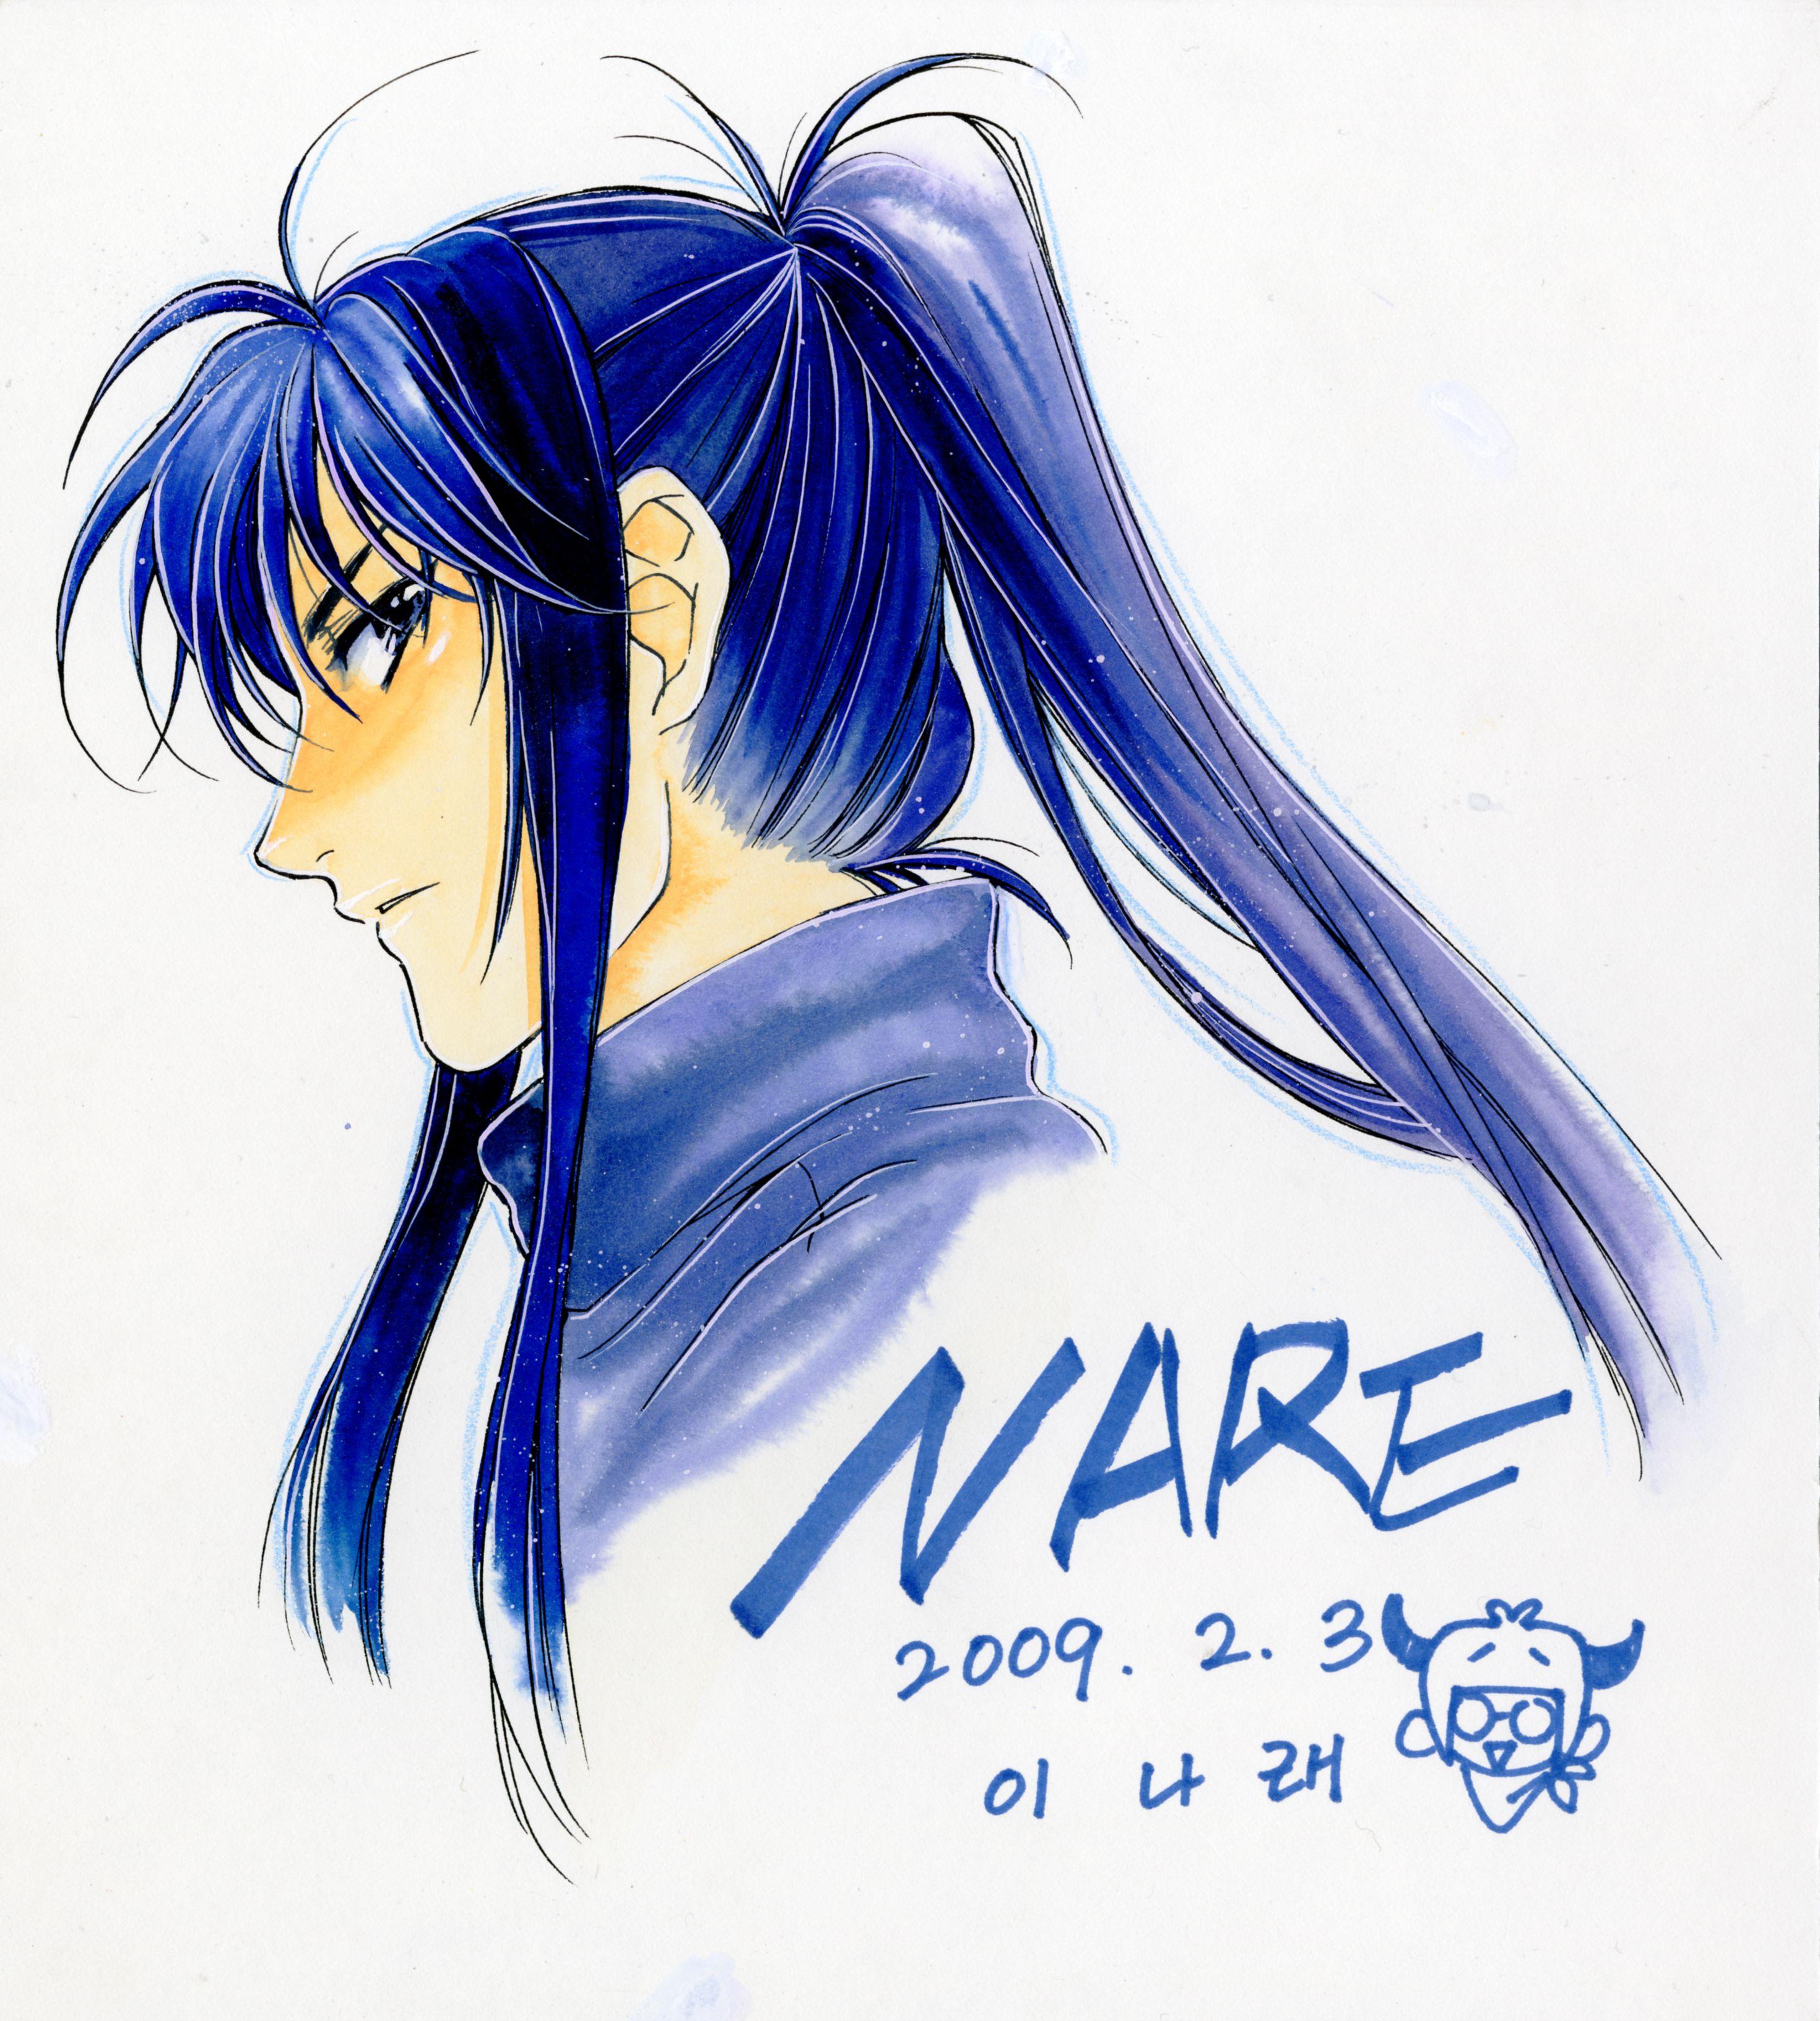 Character design for fang of the maximum ride manga